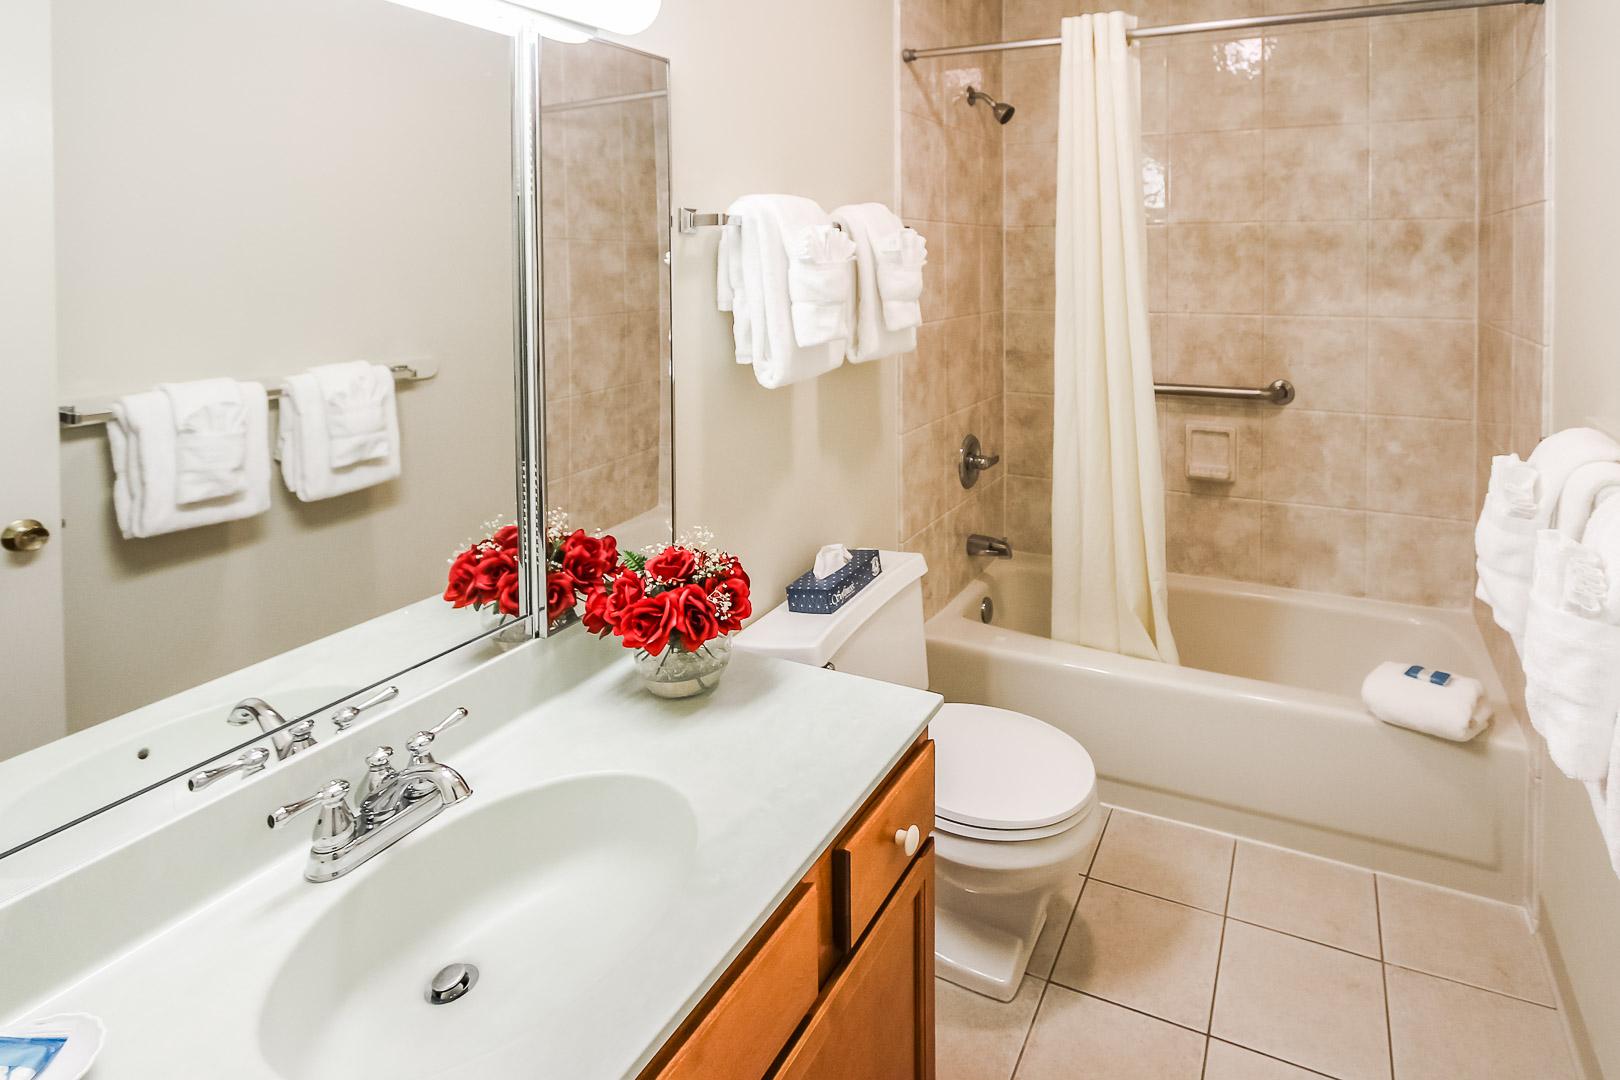 A crisp and clean bathroom at VRI's Brewster Green Resort in Massachusetts.